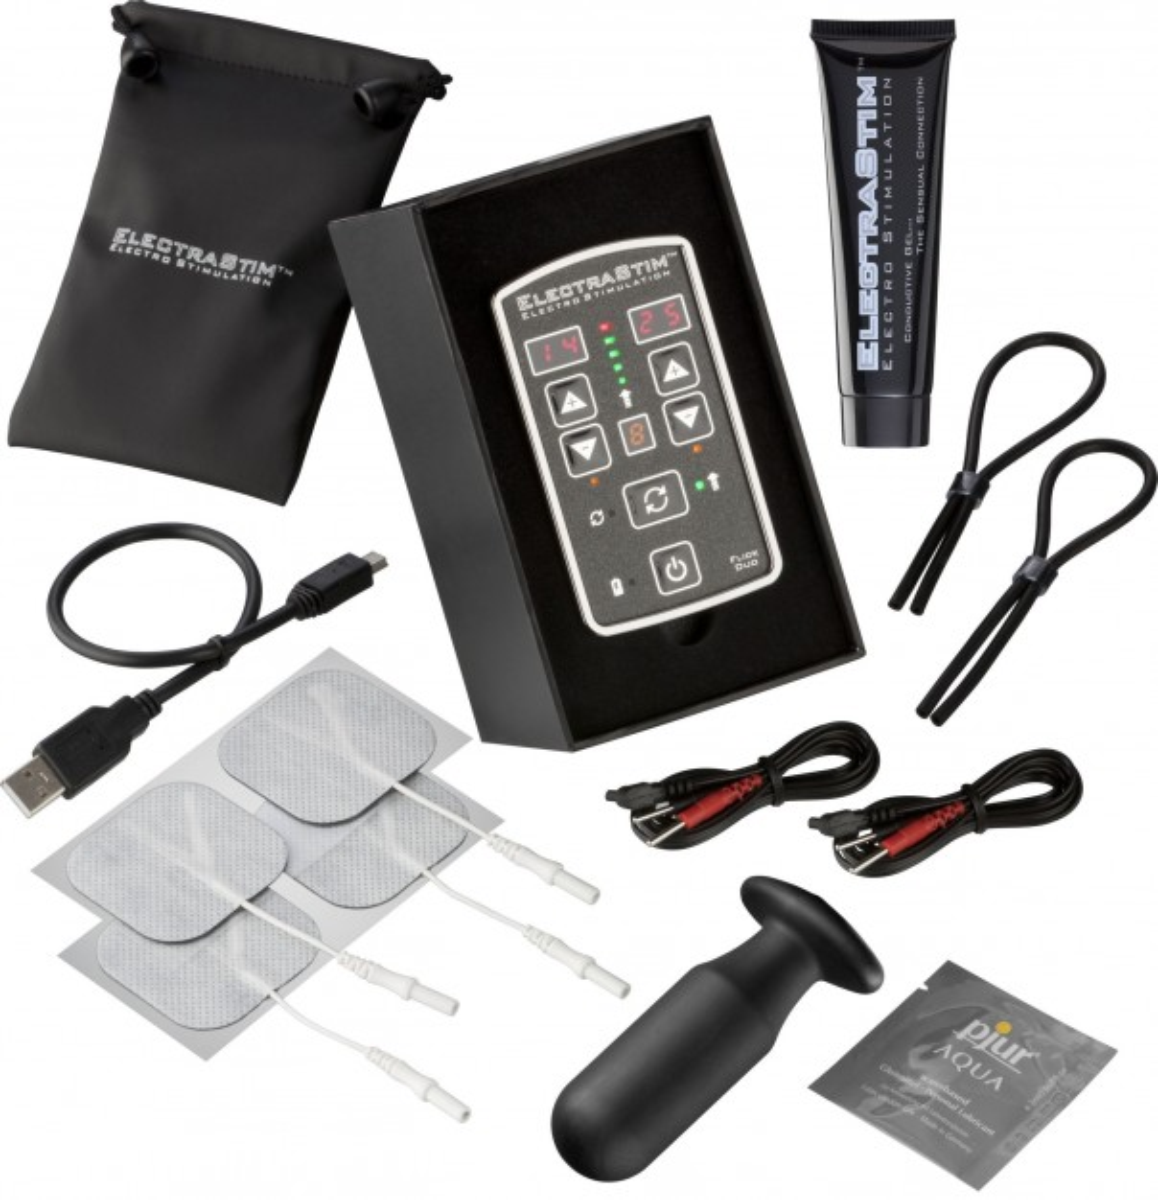 Stimulátor ElectraStim Flick Duo Multi-Pack